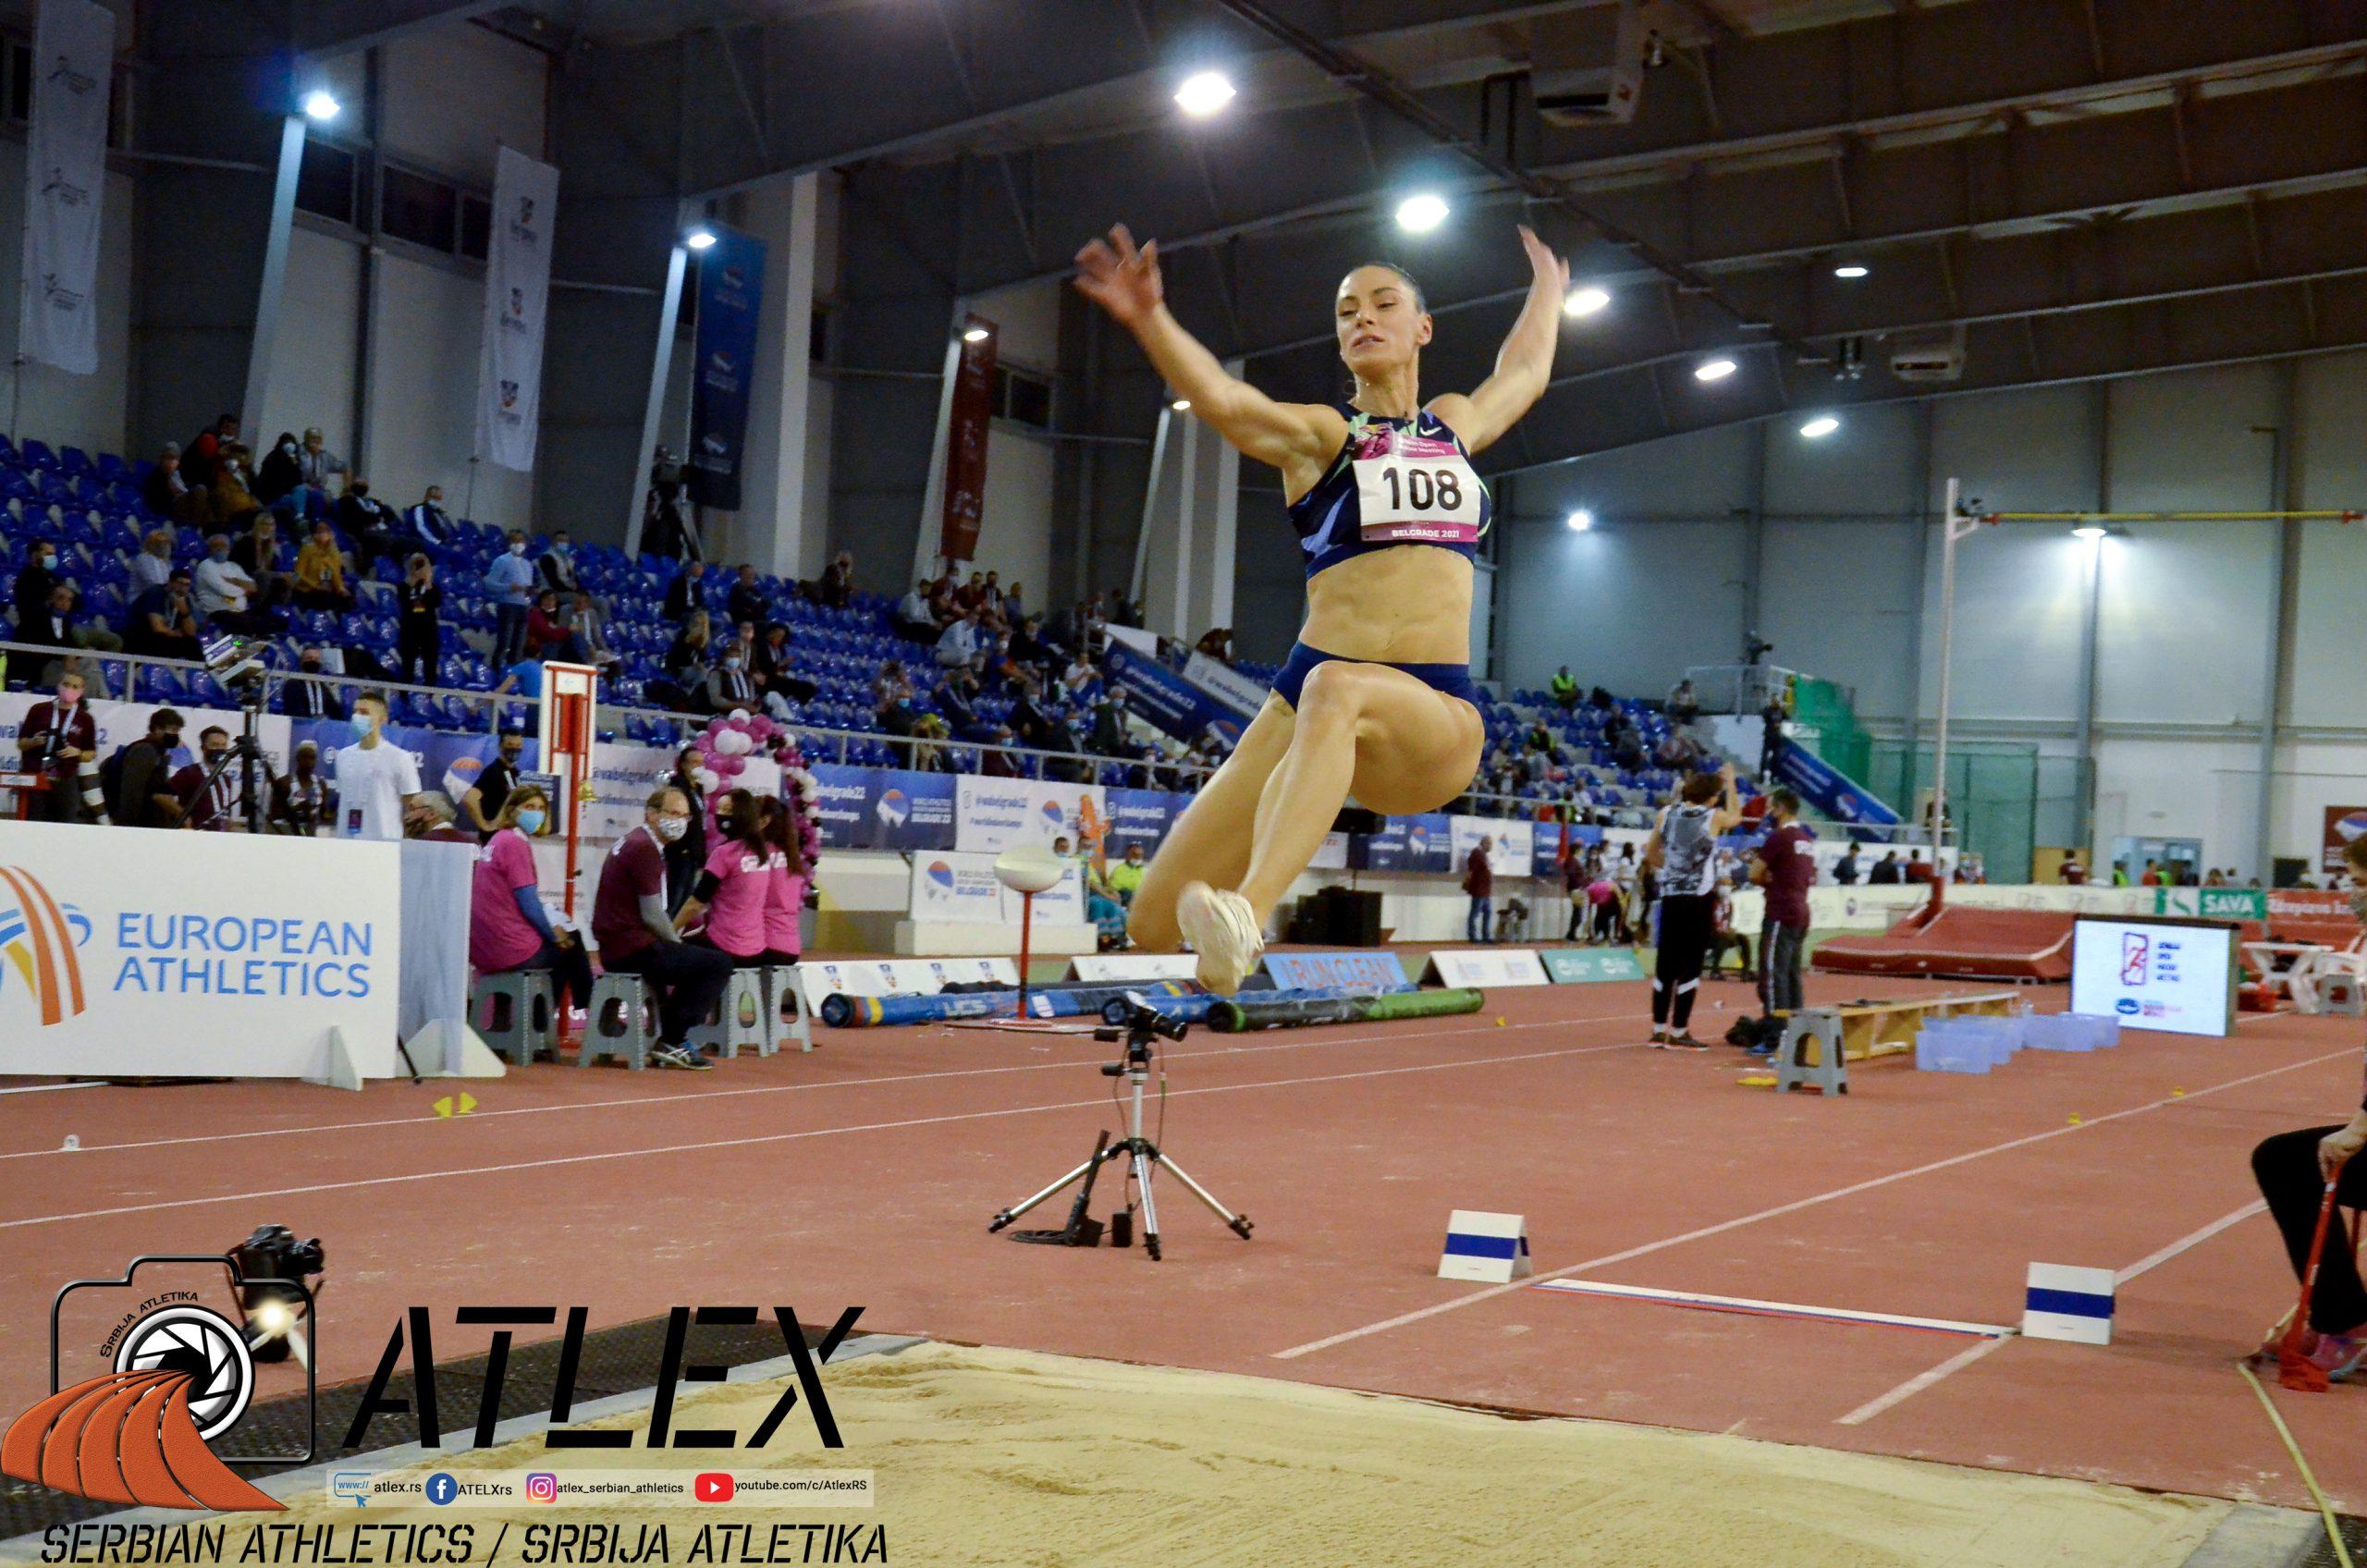 Ivana Španović, Serbian open 2021